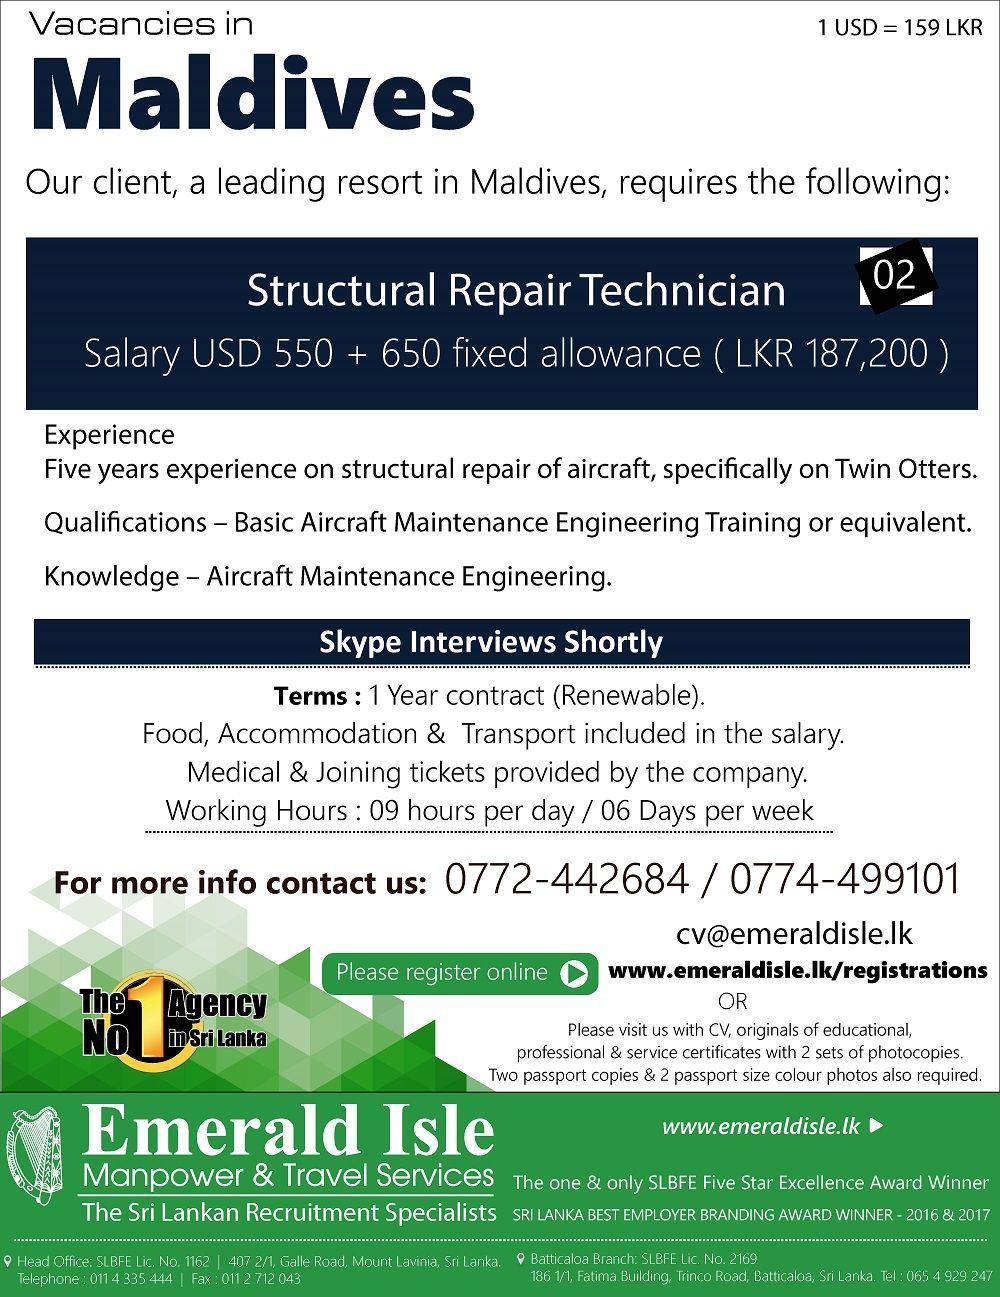 Emerald Isle Recruitment Specialist Maldives resort